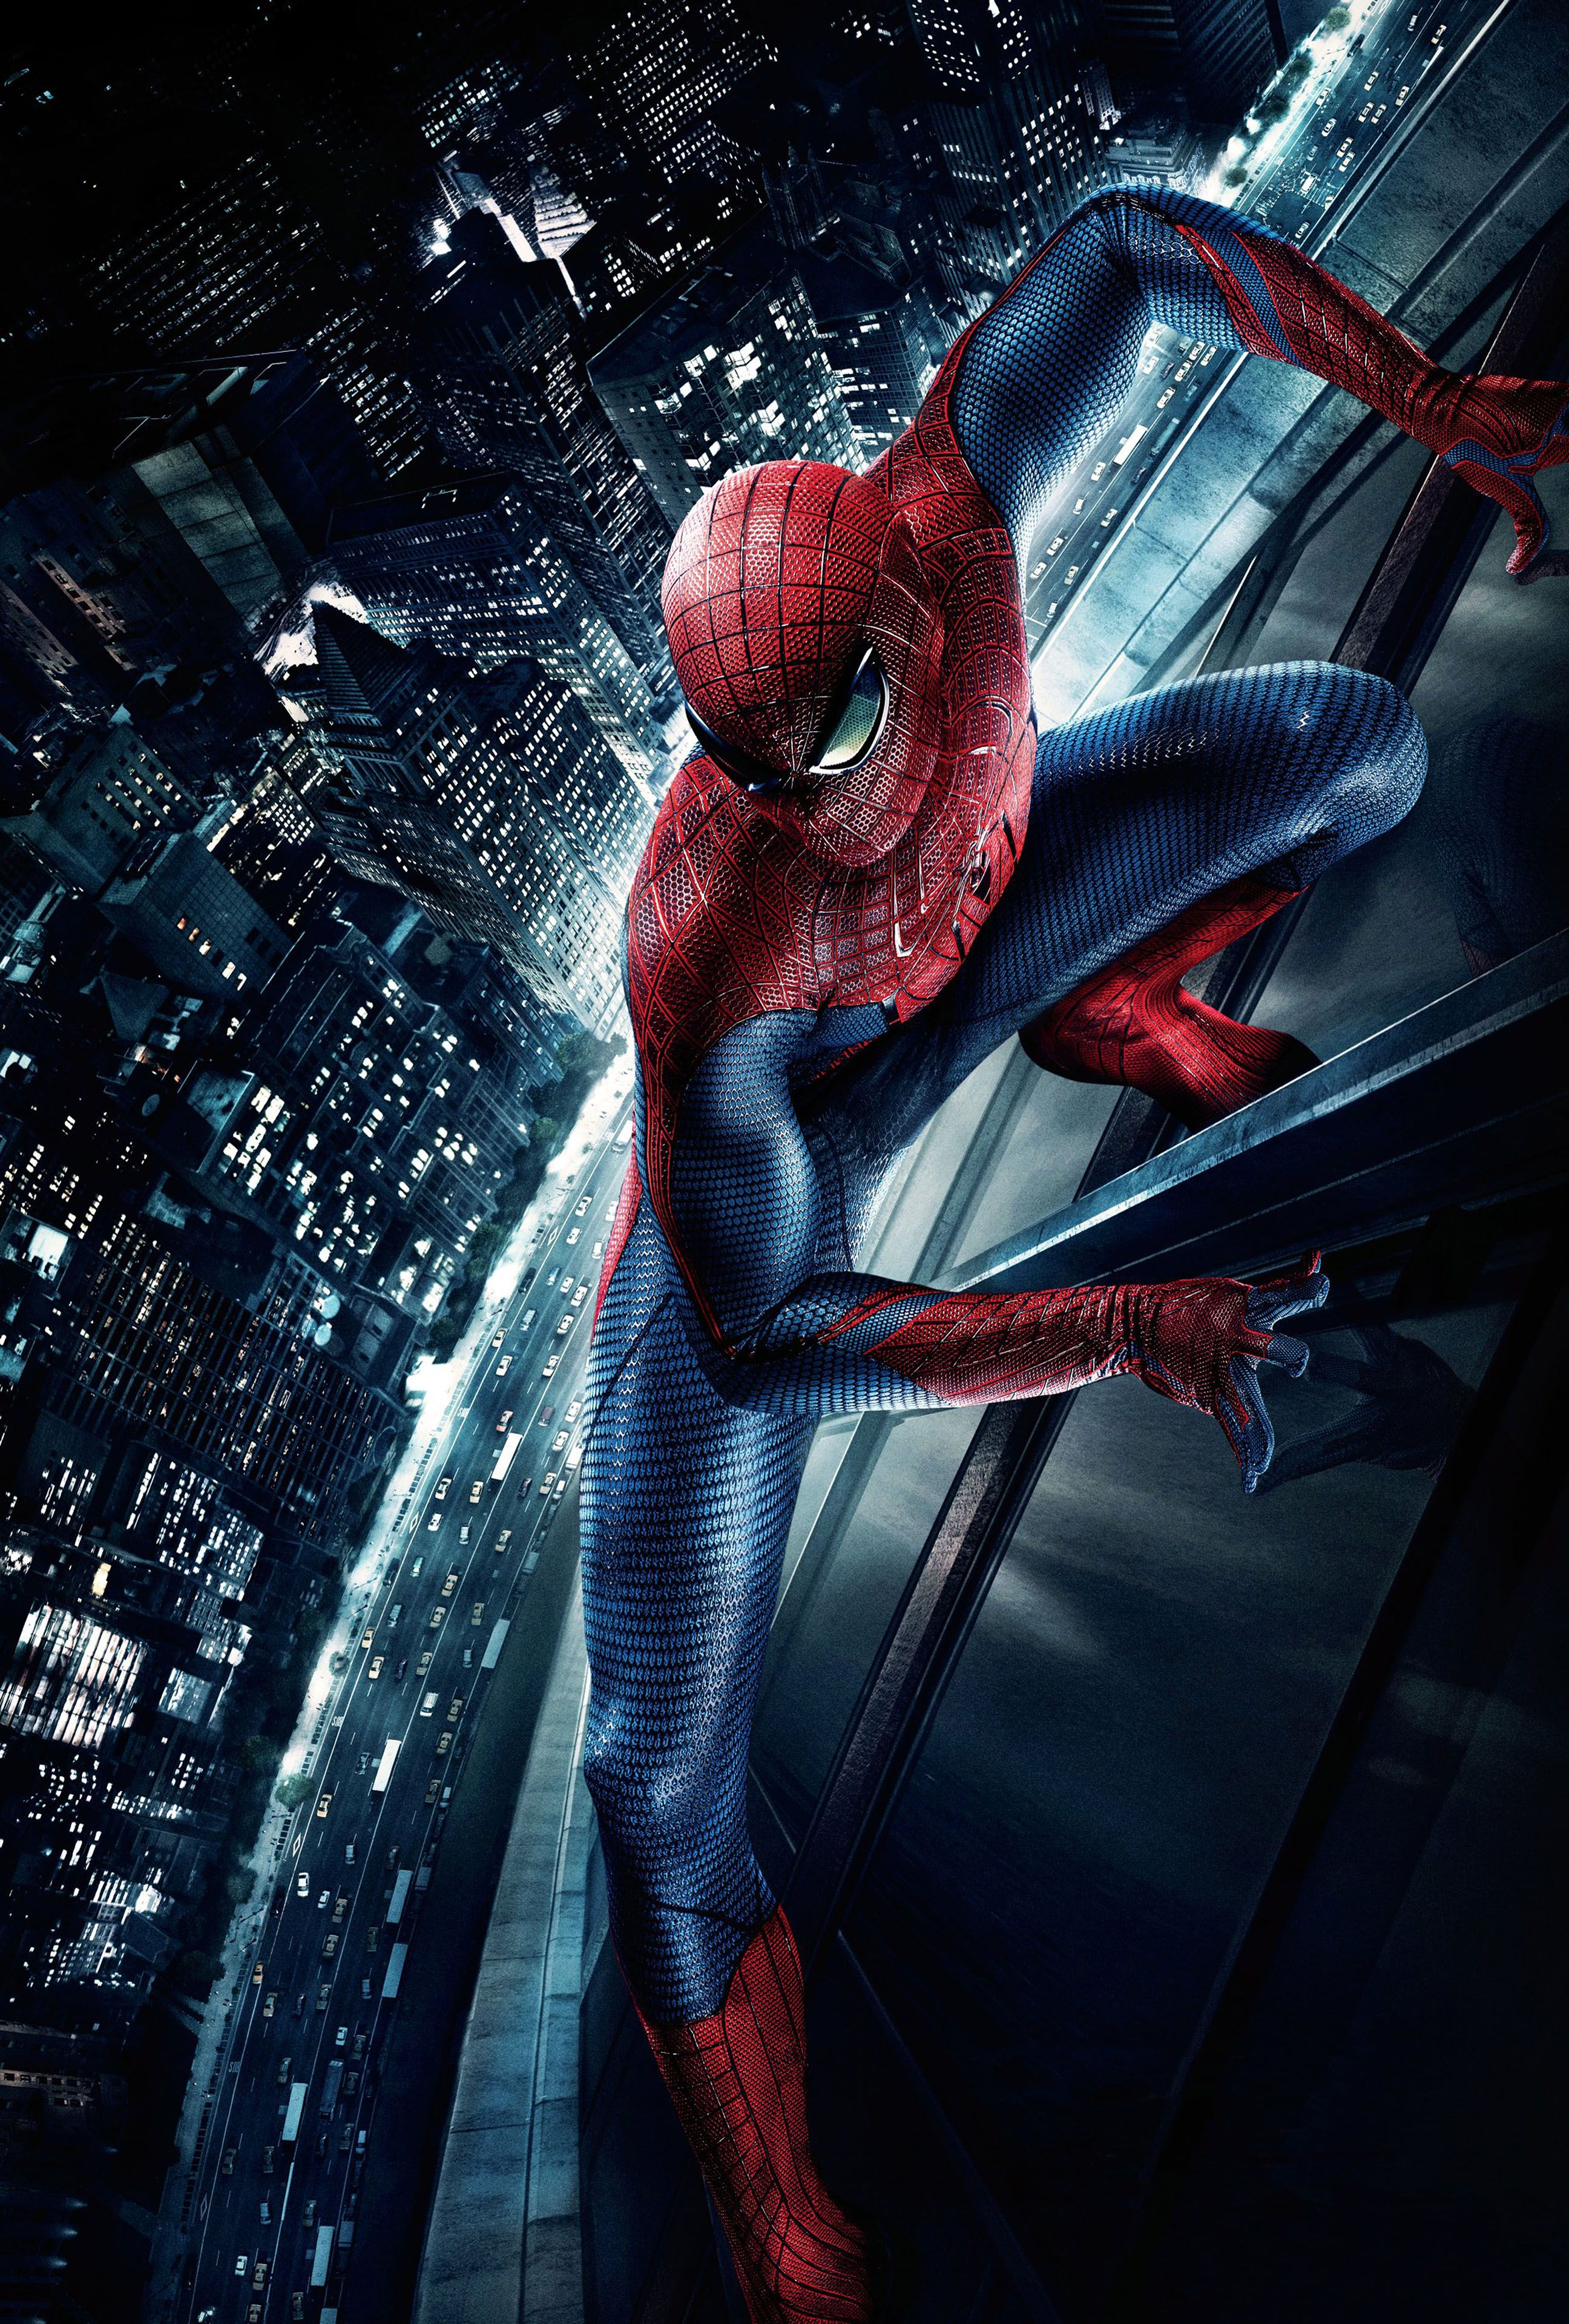 Spiderman Wallpapers Spiderman Superhero Wallpaper Amazing Spider